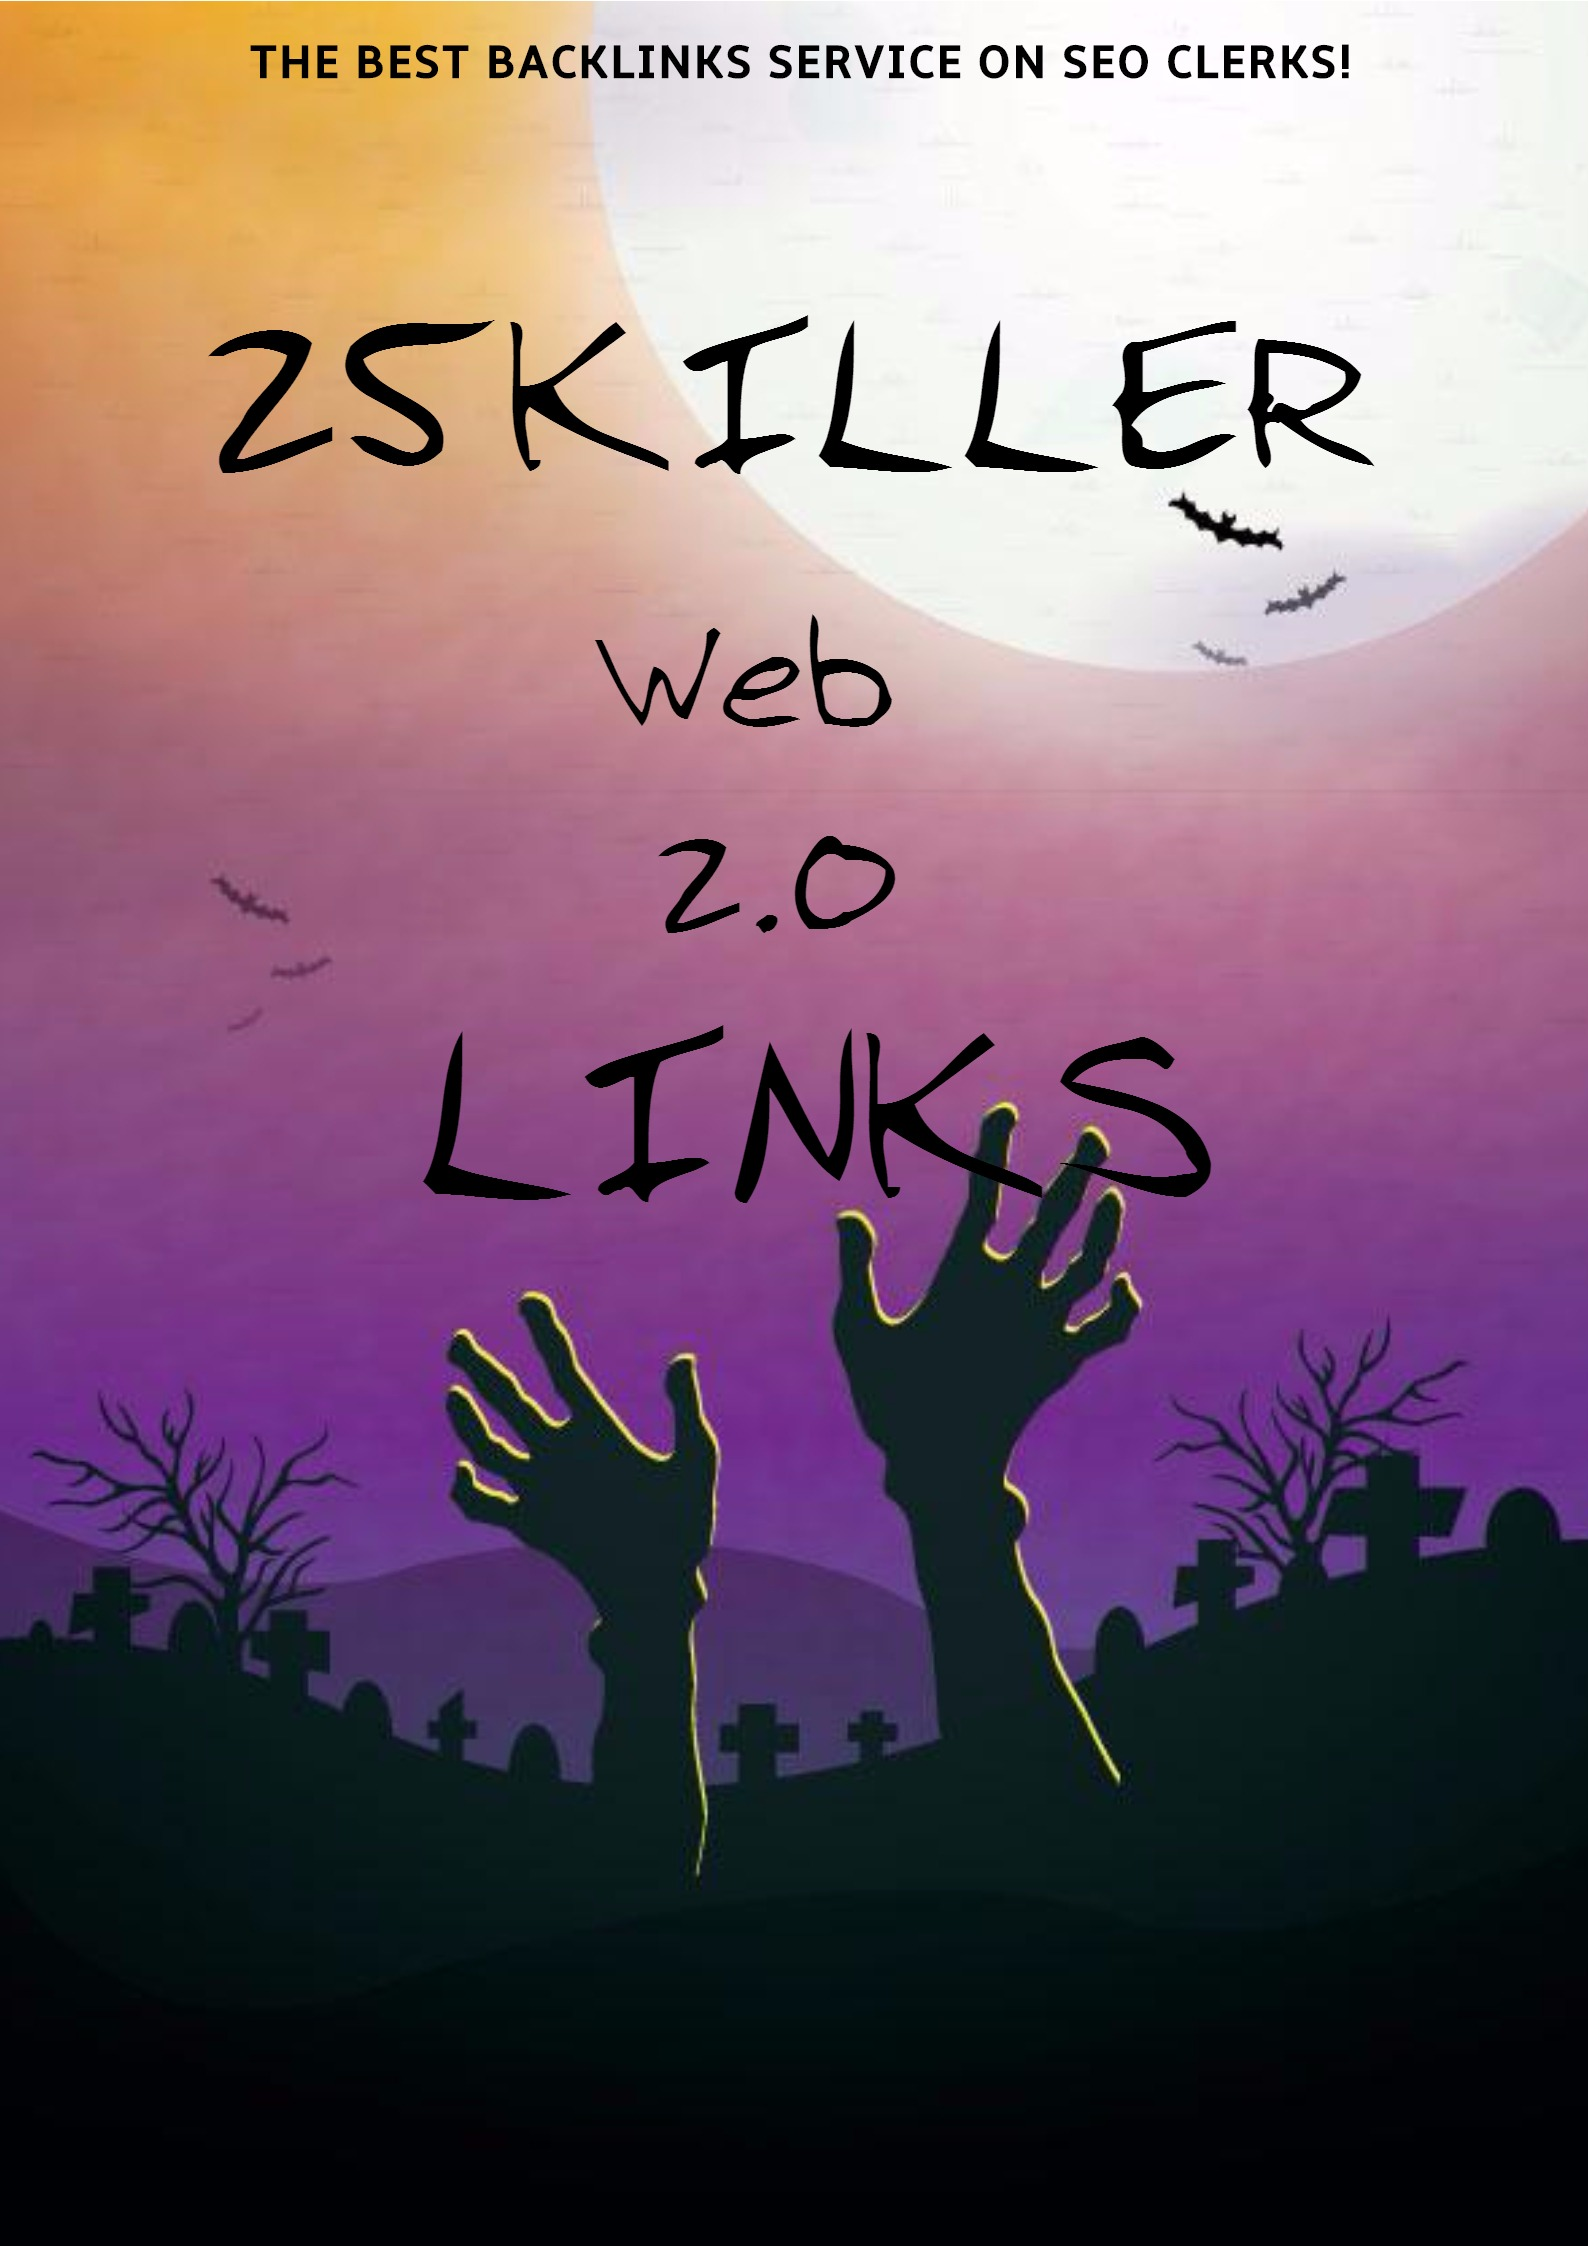 Provide 25 KILLER Seo web backlinks